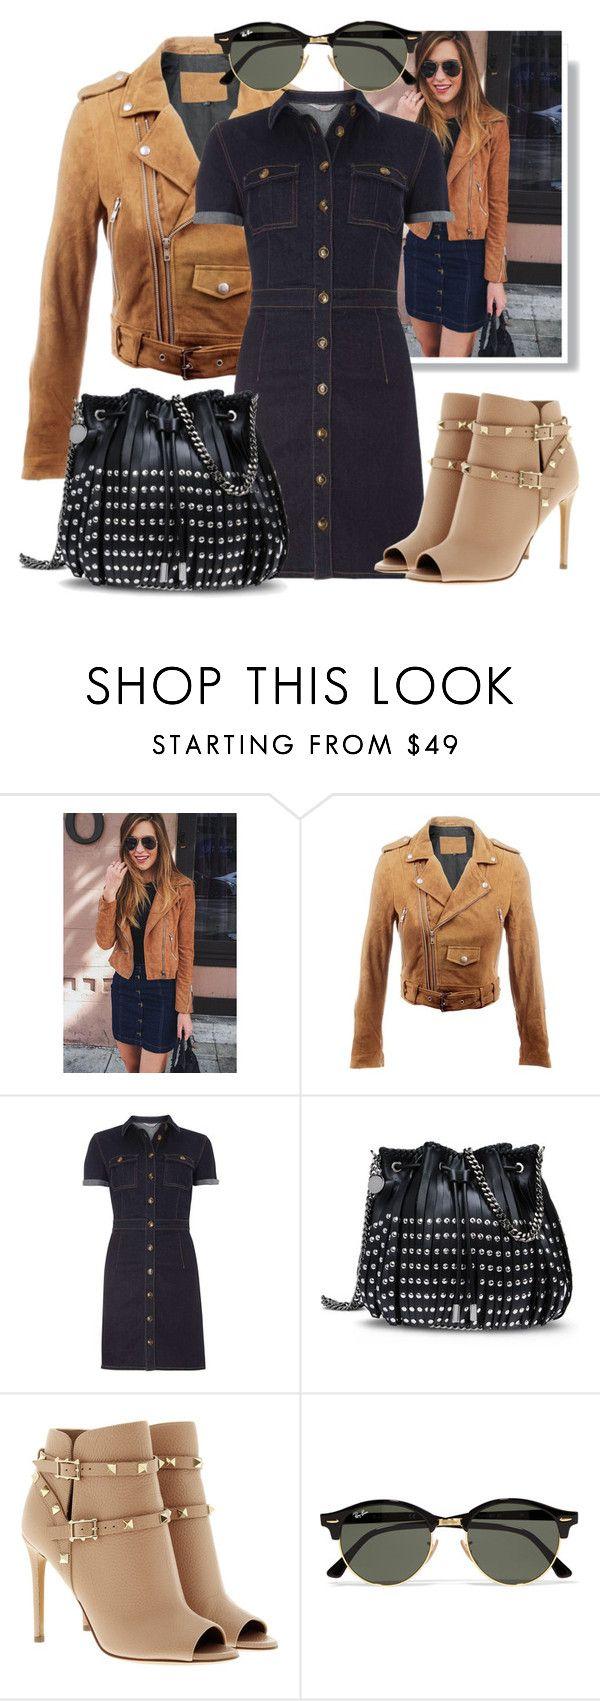 """Denim dress&leather jacket"" by minaagar liked on Polyvore"